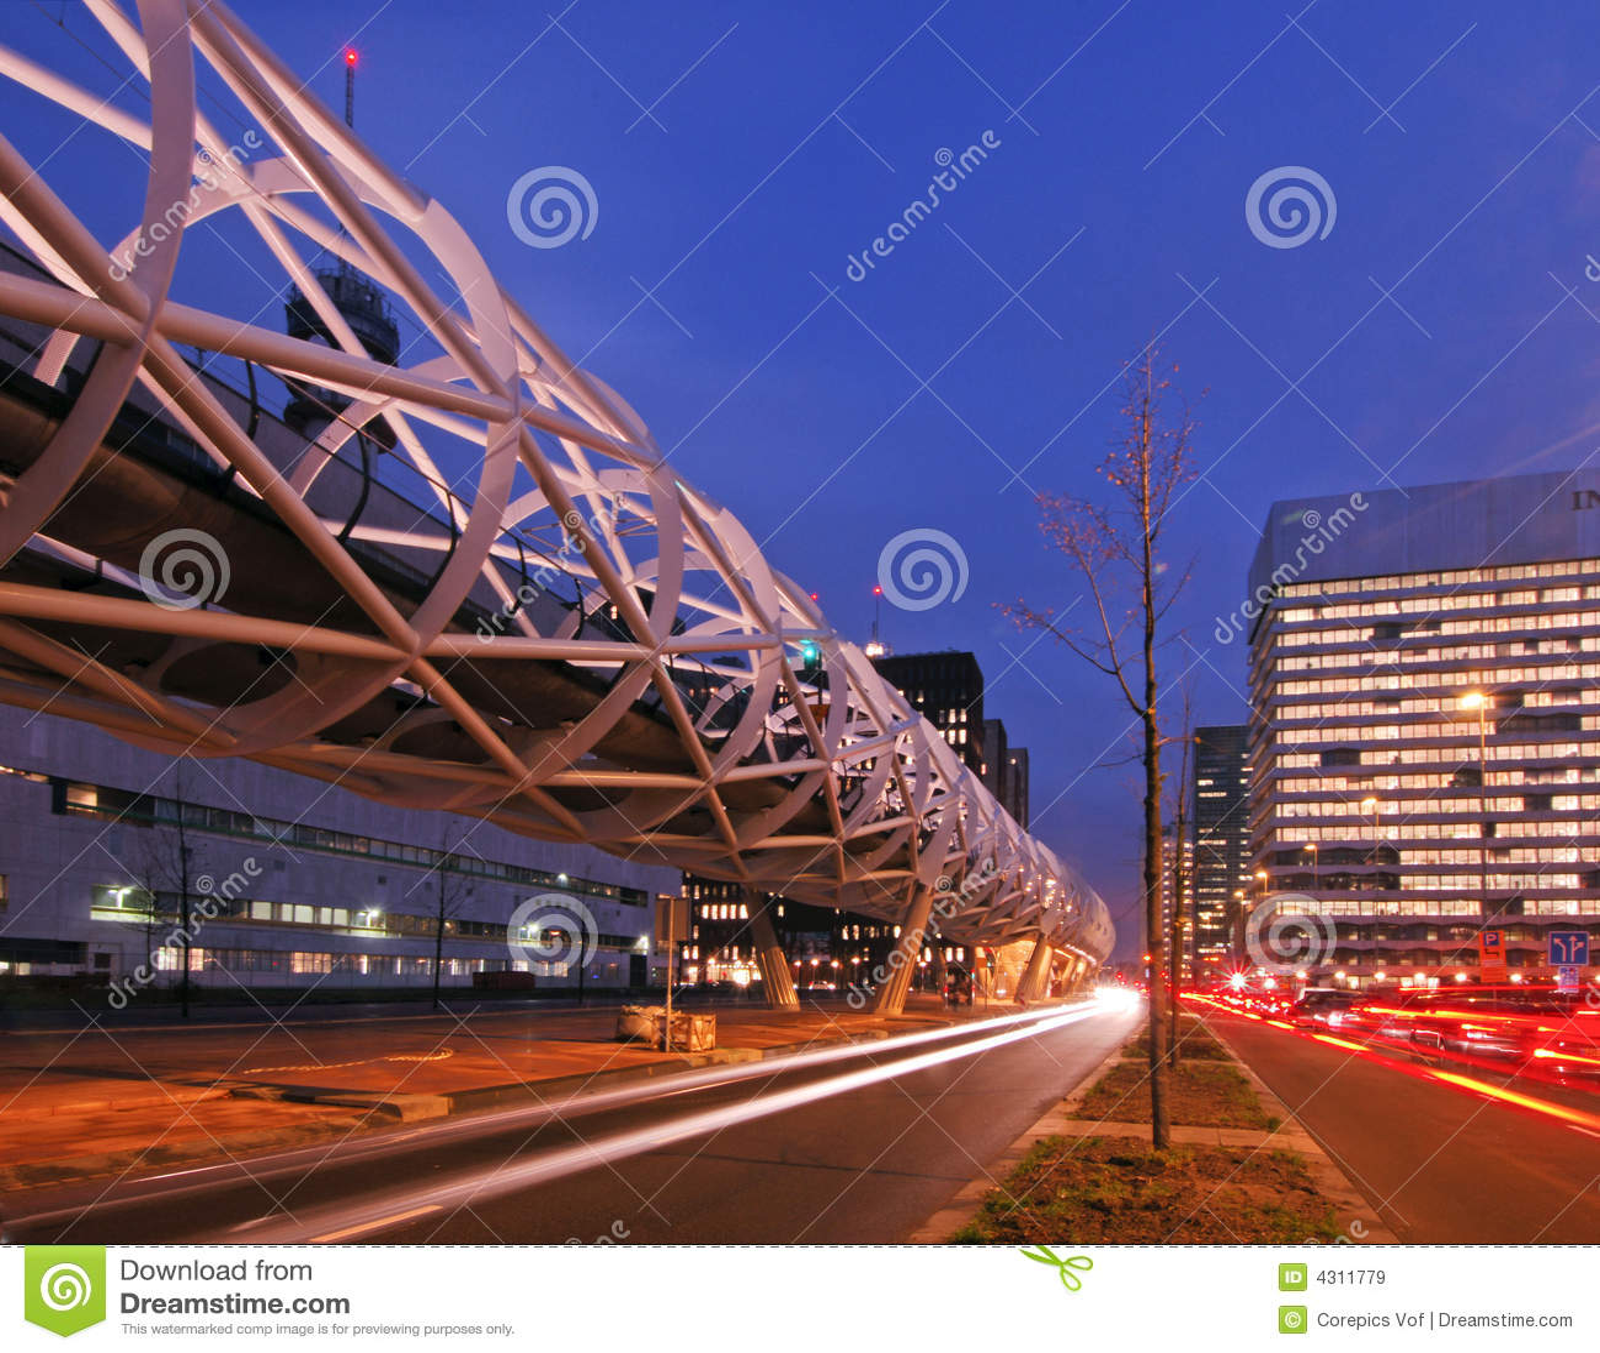 elevated-tram-structure-4311779.jpg